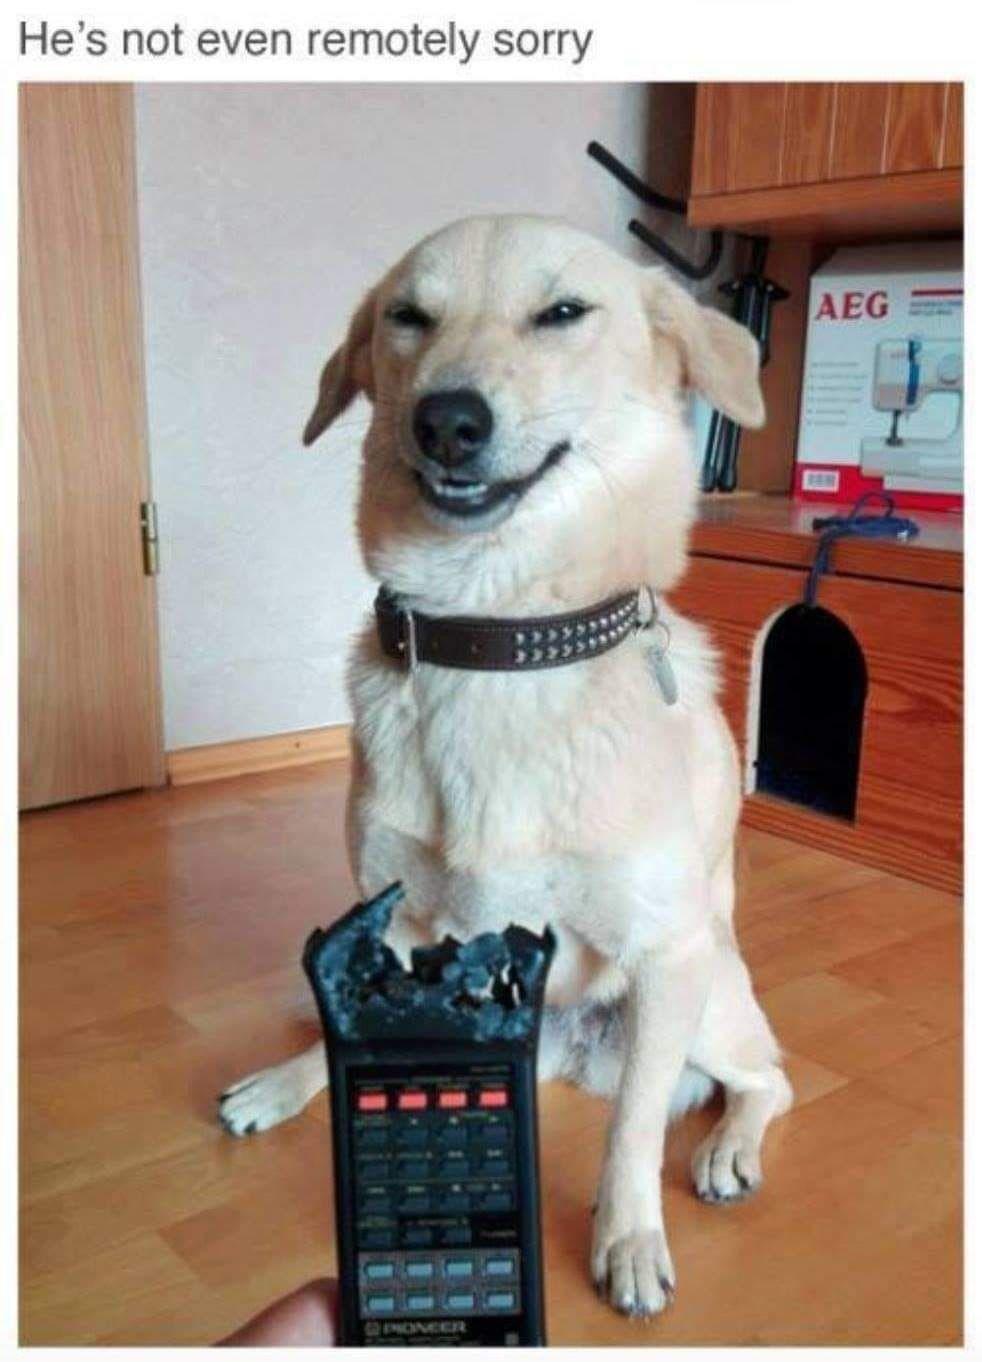 Pin By Danielle Kraft On Funny Animal Jokes Funny Animal Pictures Funny Animal Memes